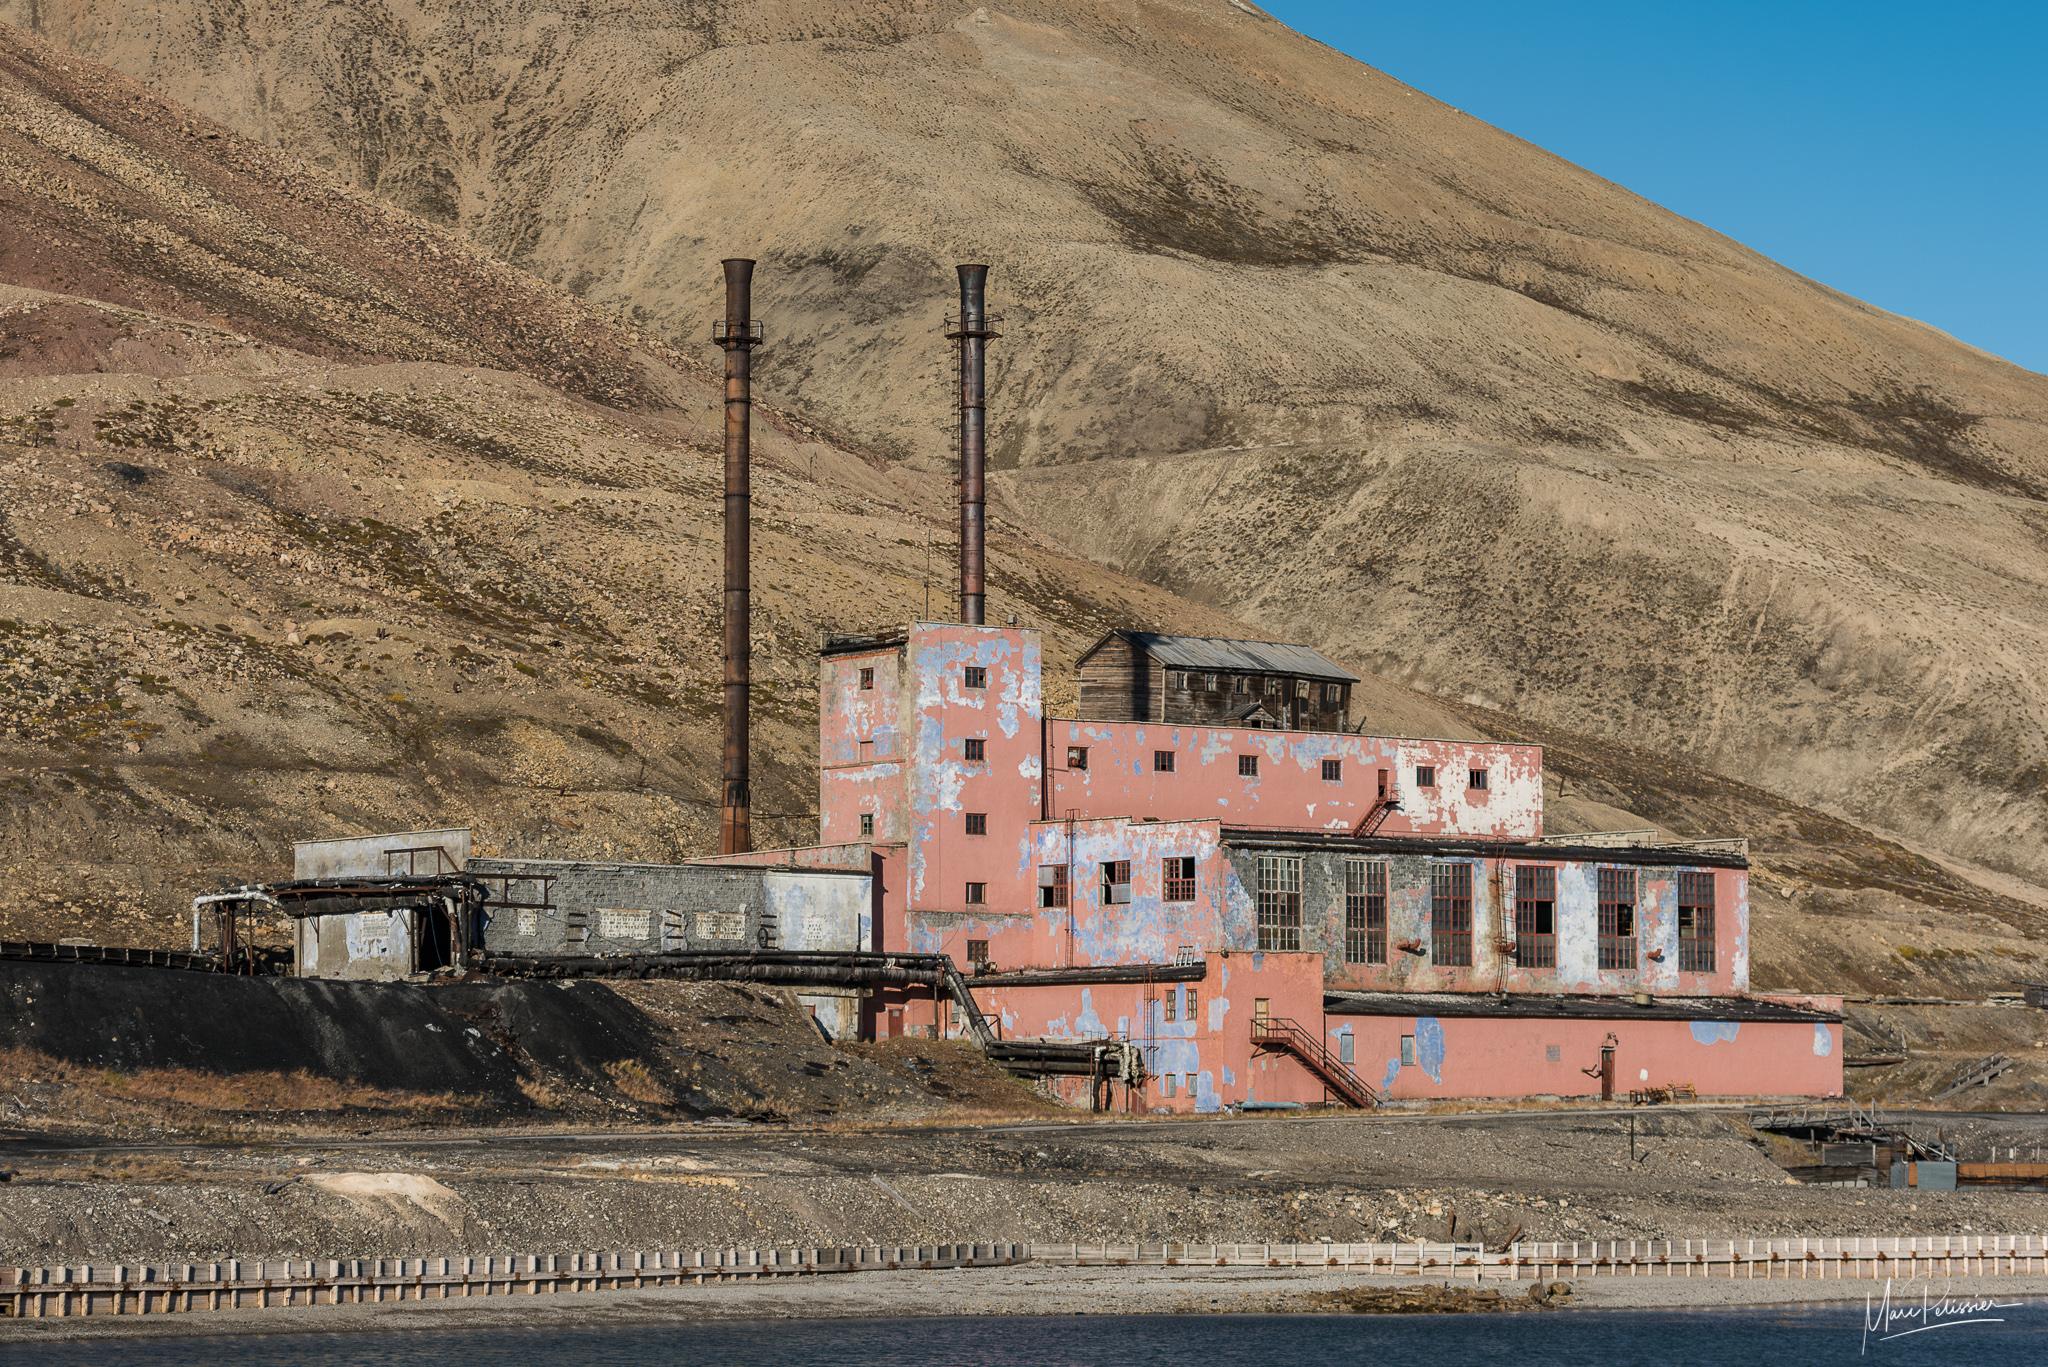 The abandoned factory of Pyramiden, Svalbard & Jan Mayen Islands